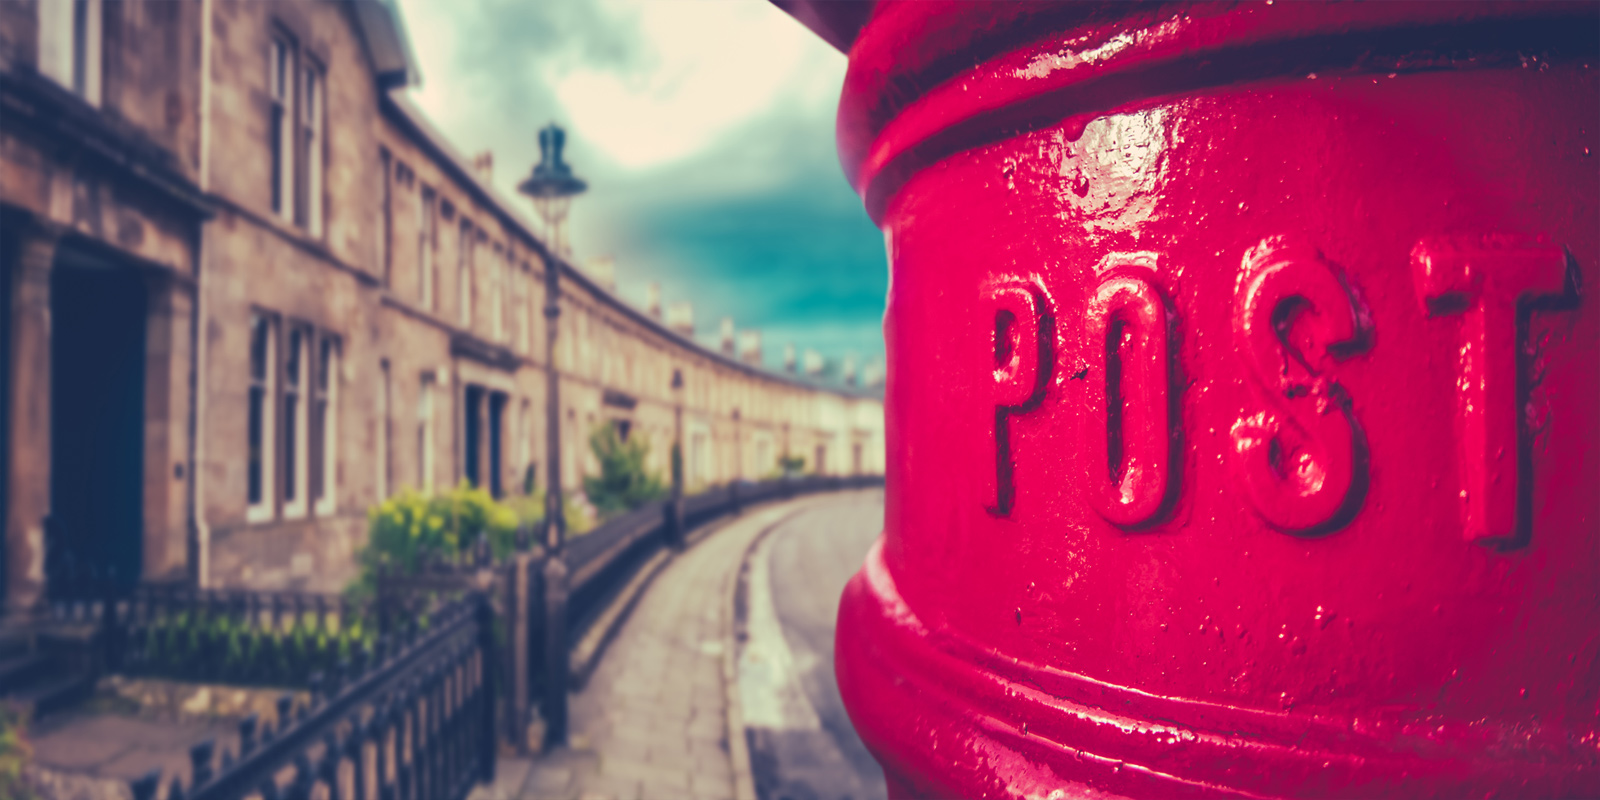 Проект The Royal Mail